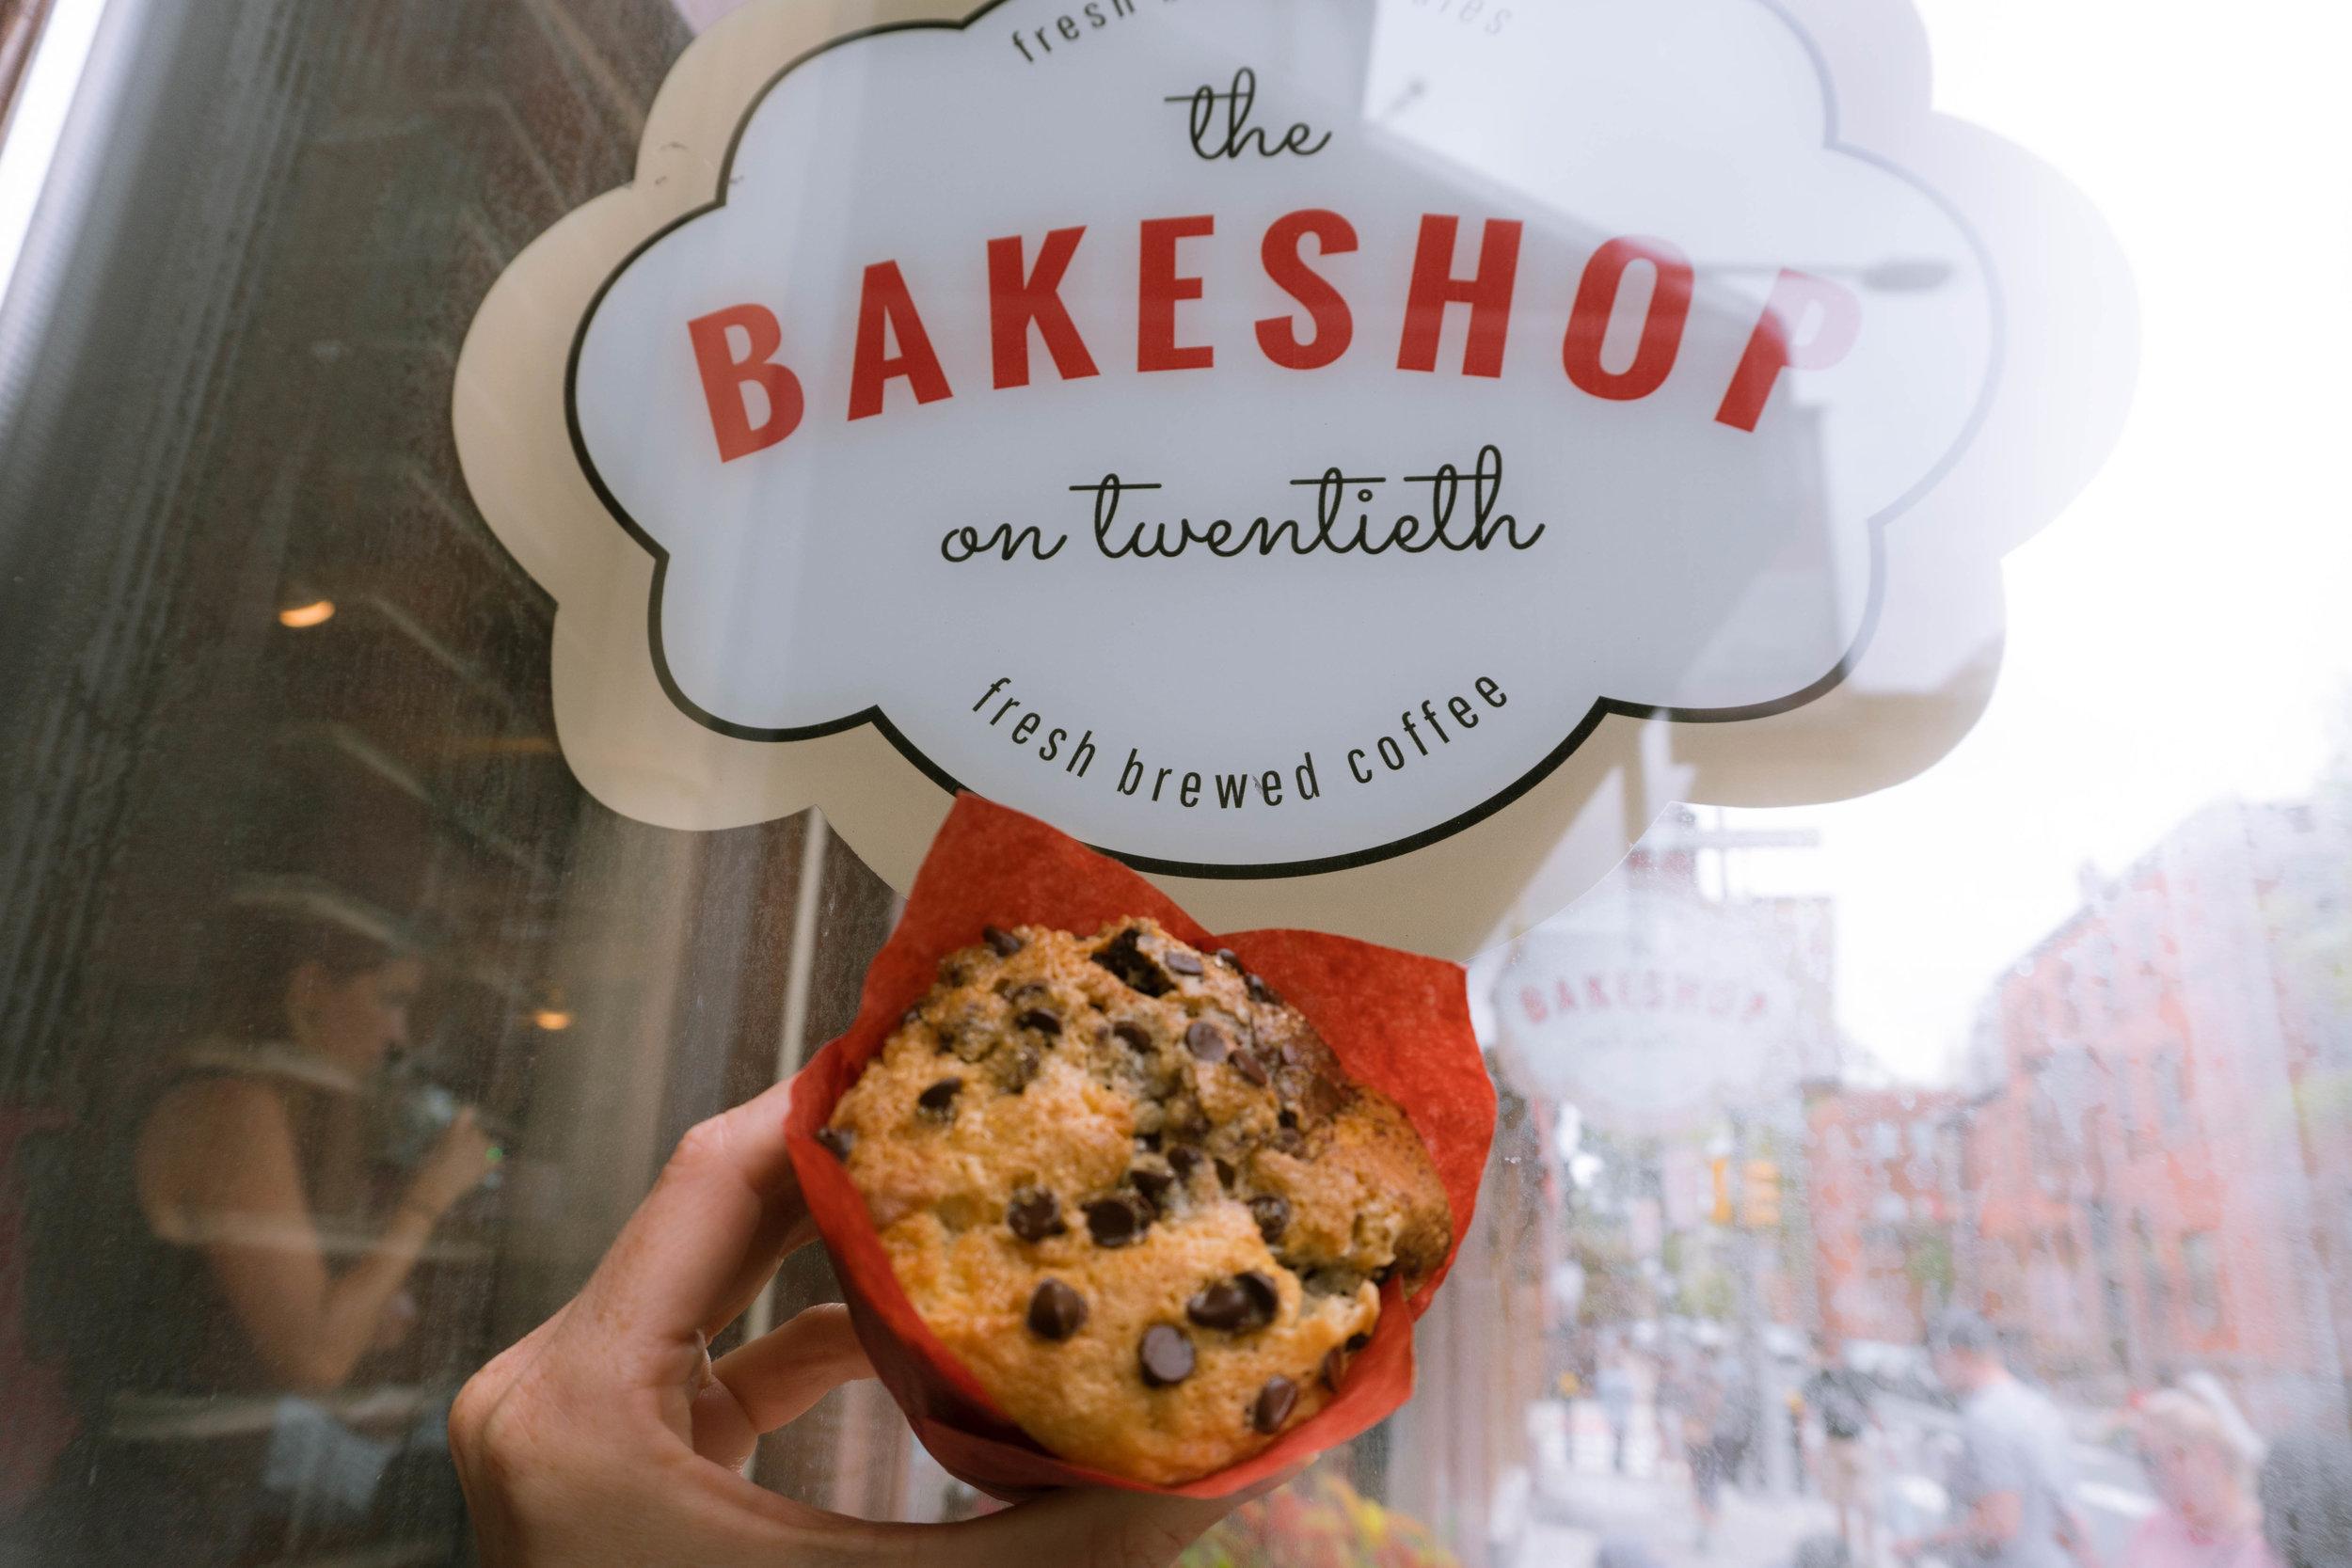 filladelphia.bakery on 20th.jpg